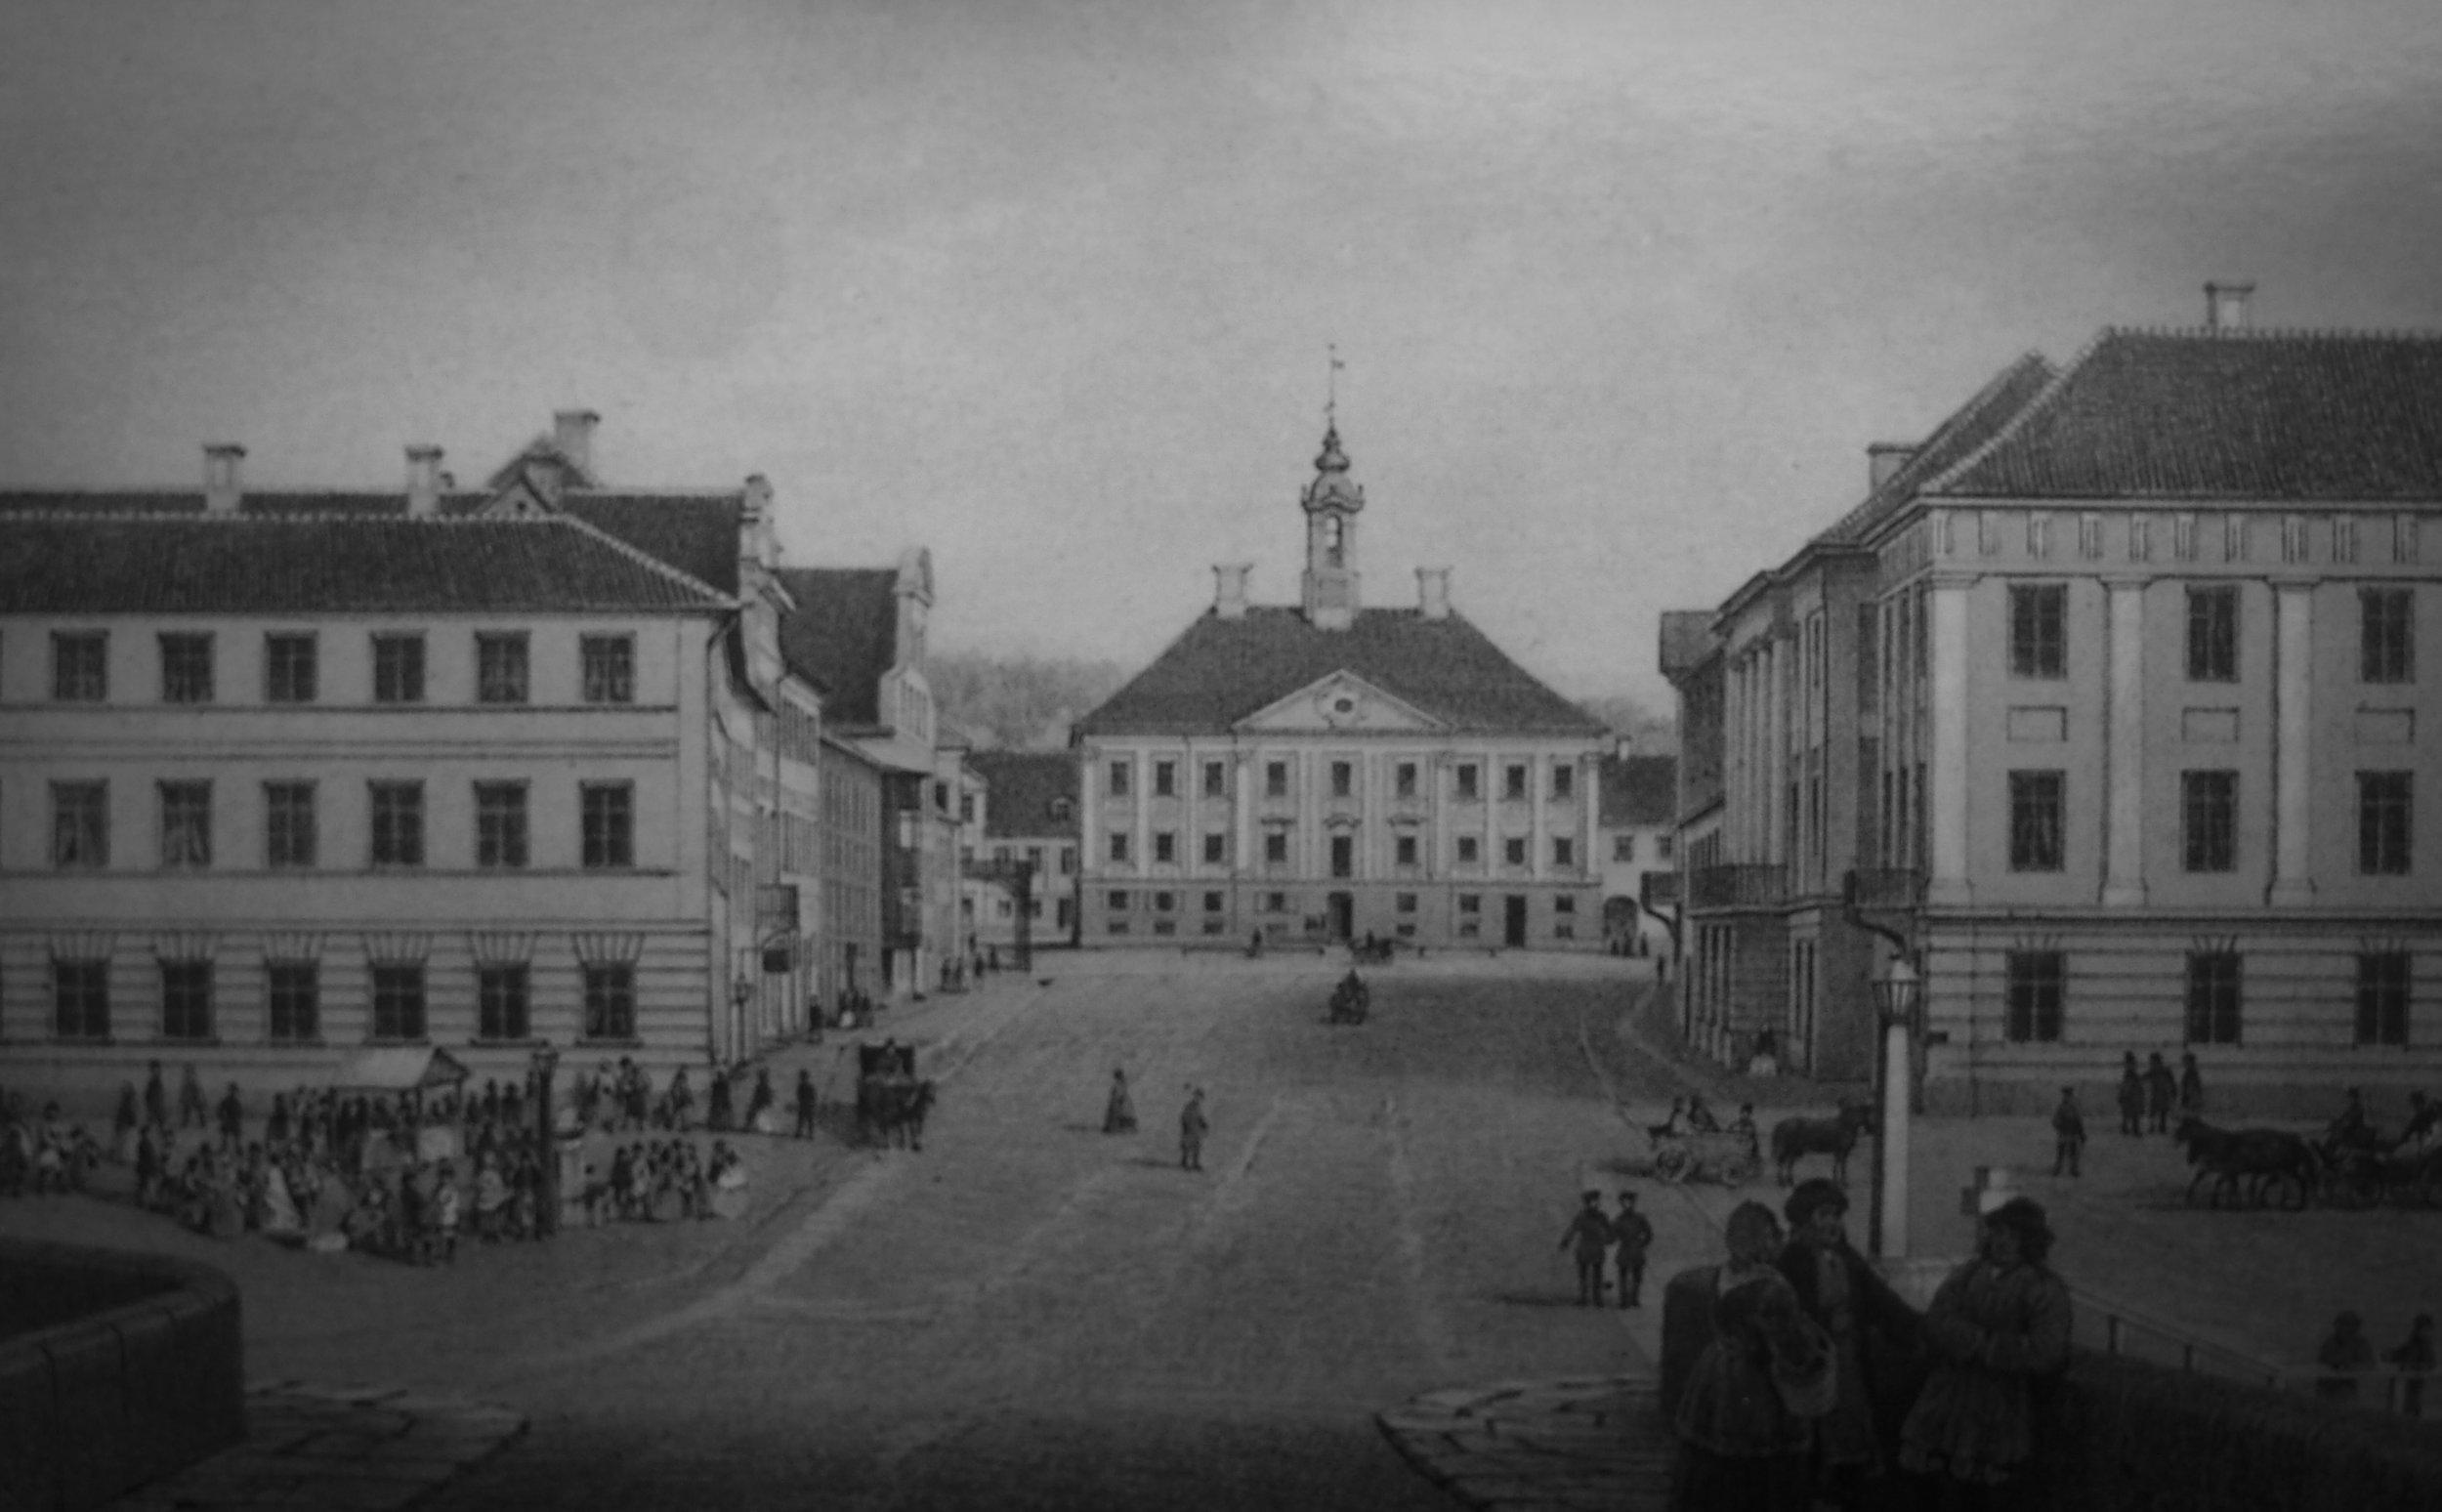 Postkaart-Höflinger-Raekoja-plats.jpg